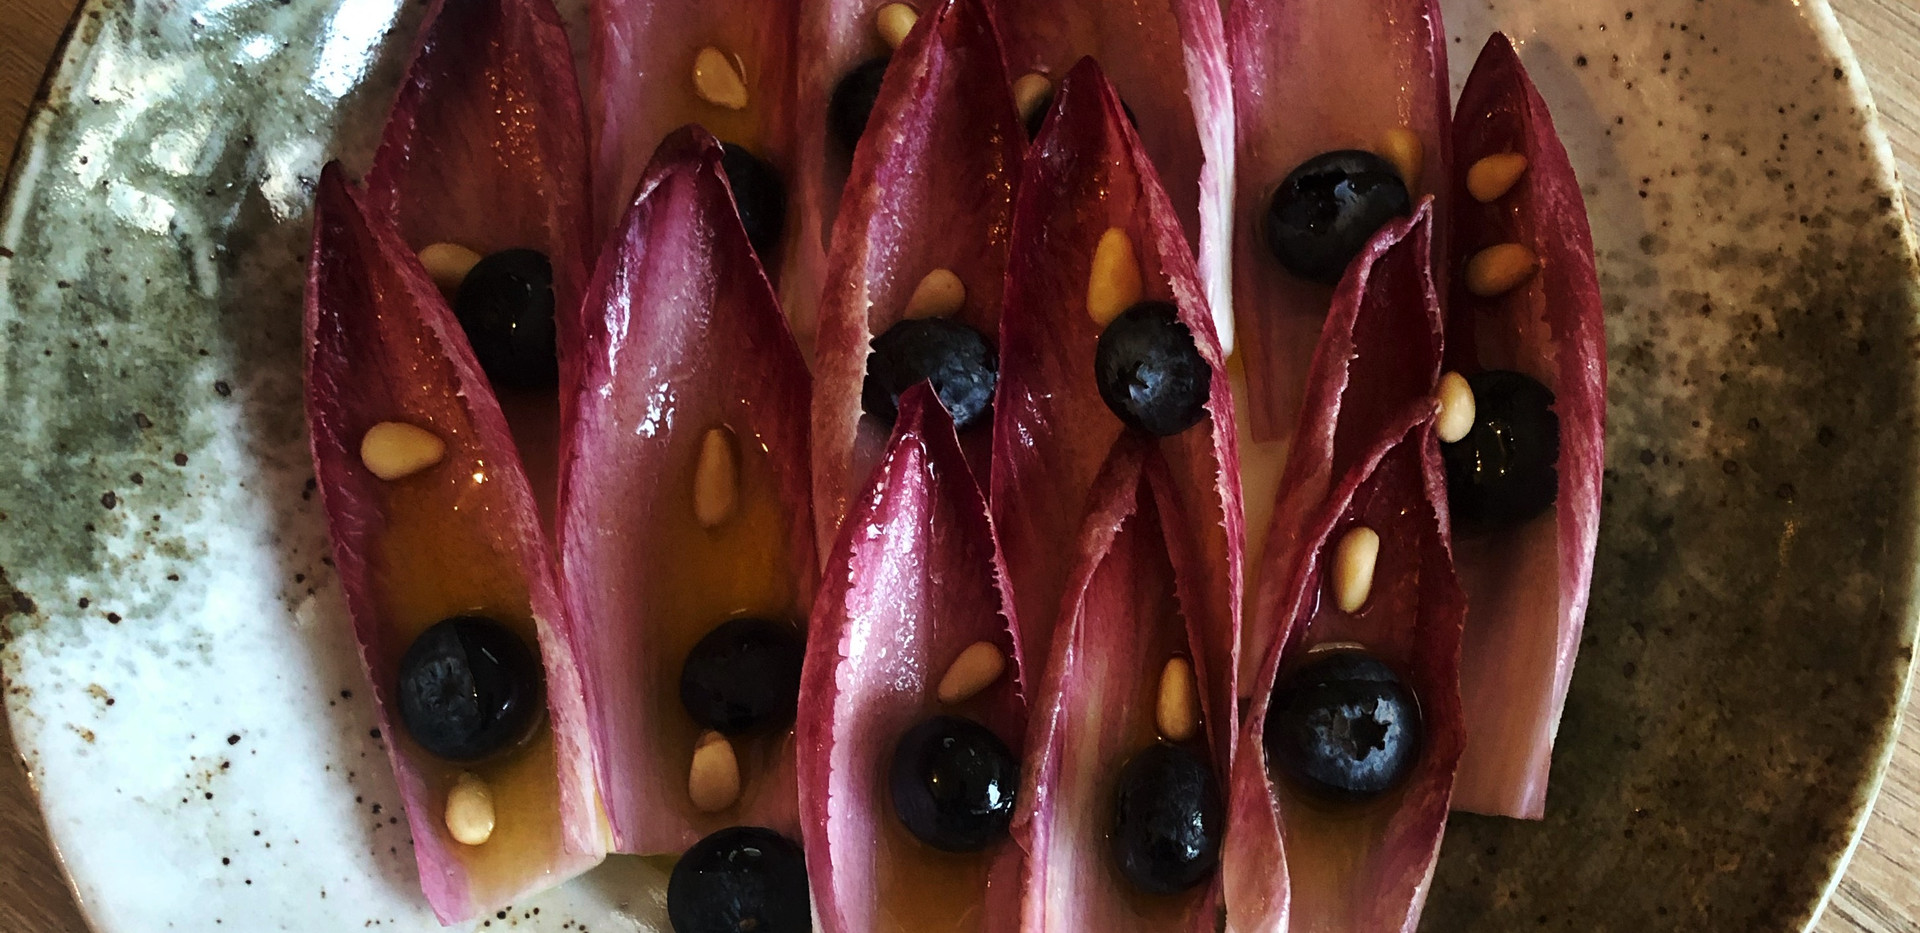 Red Endive - Berries - Stilton